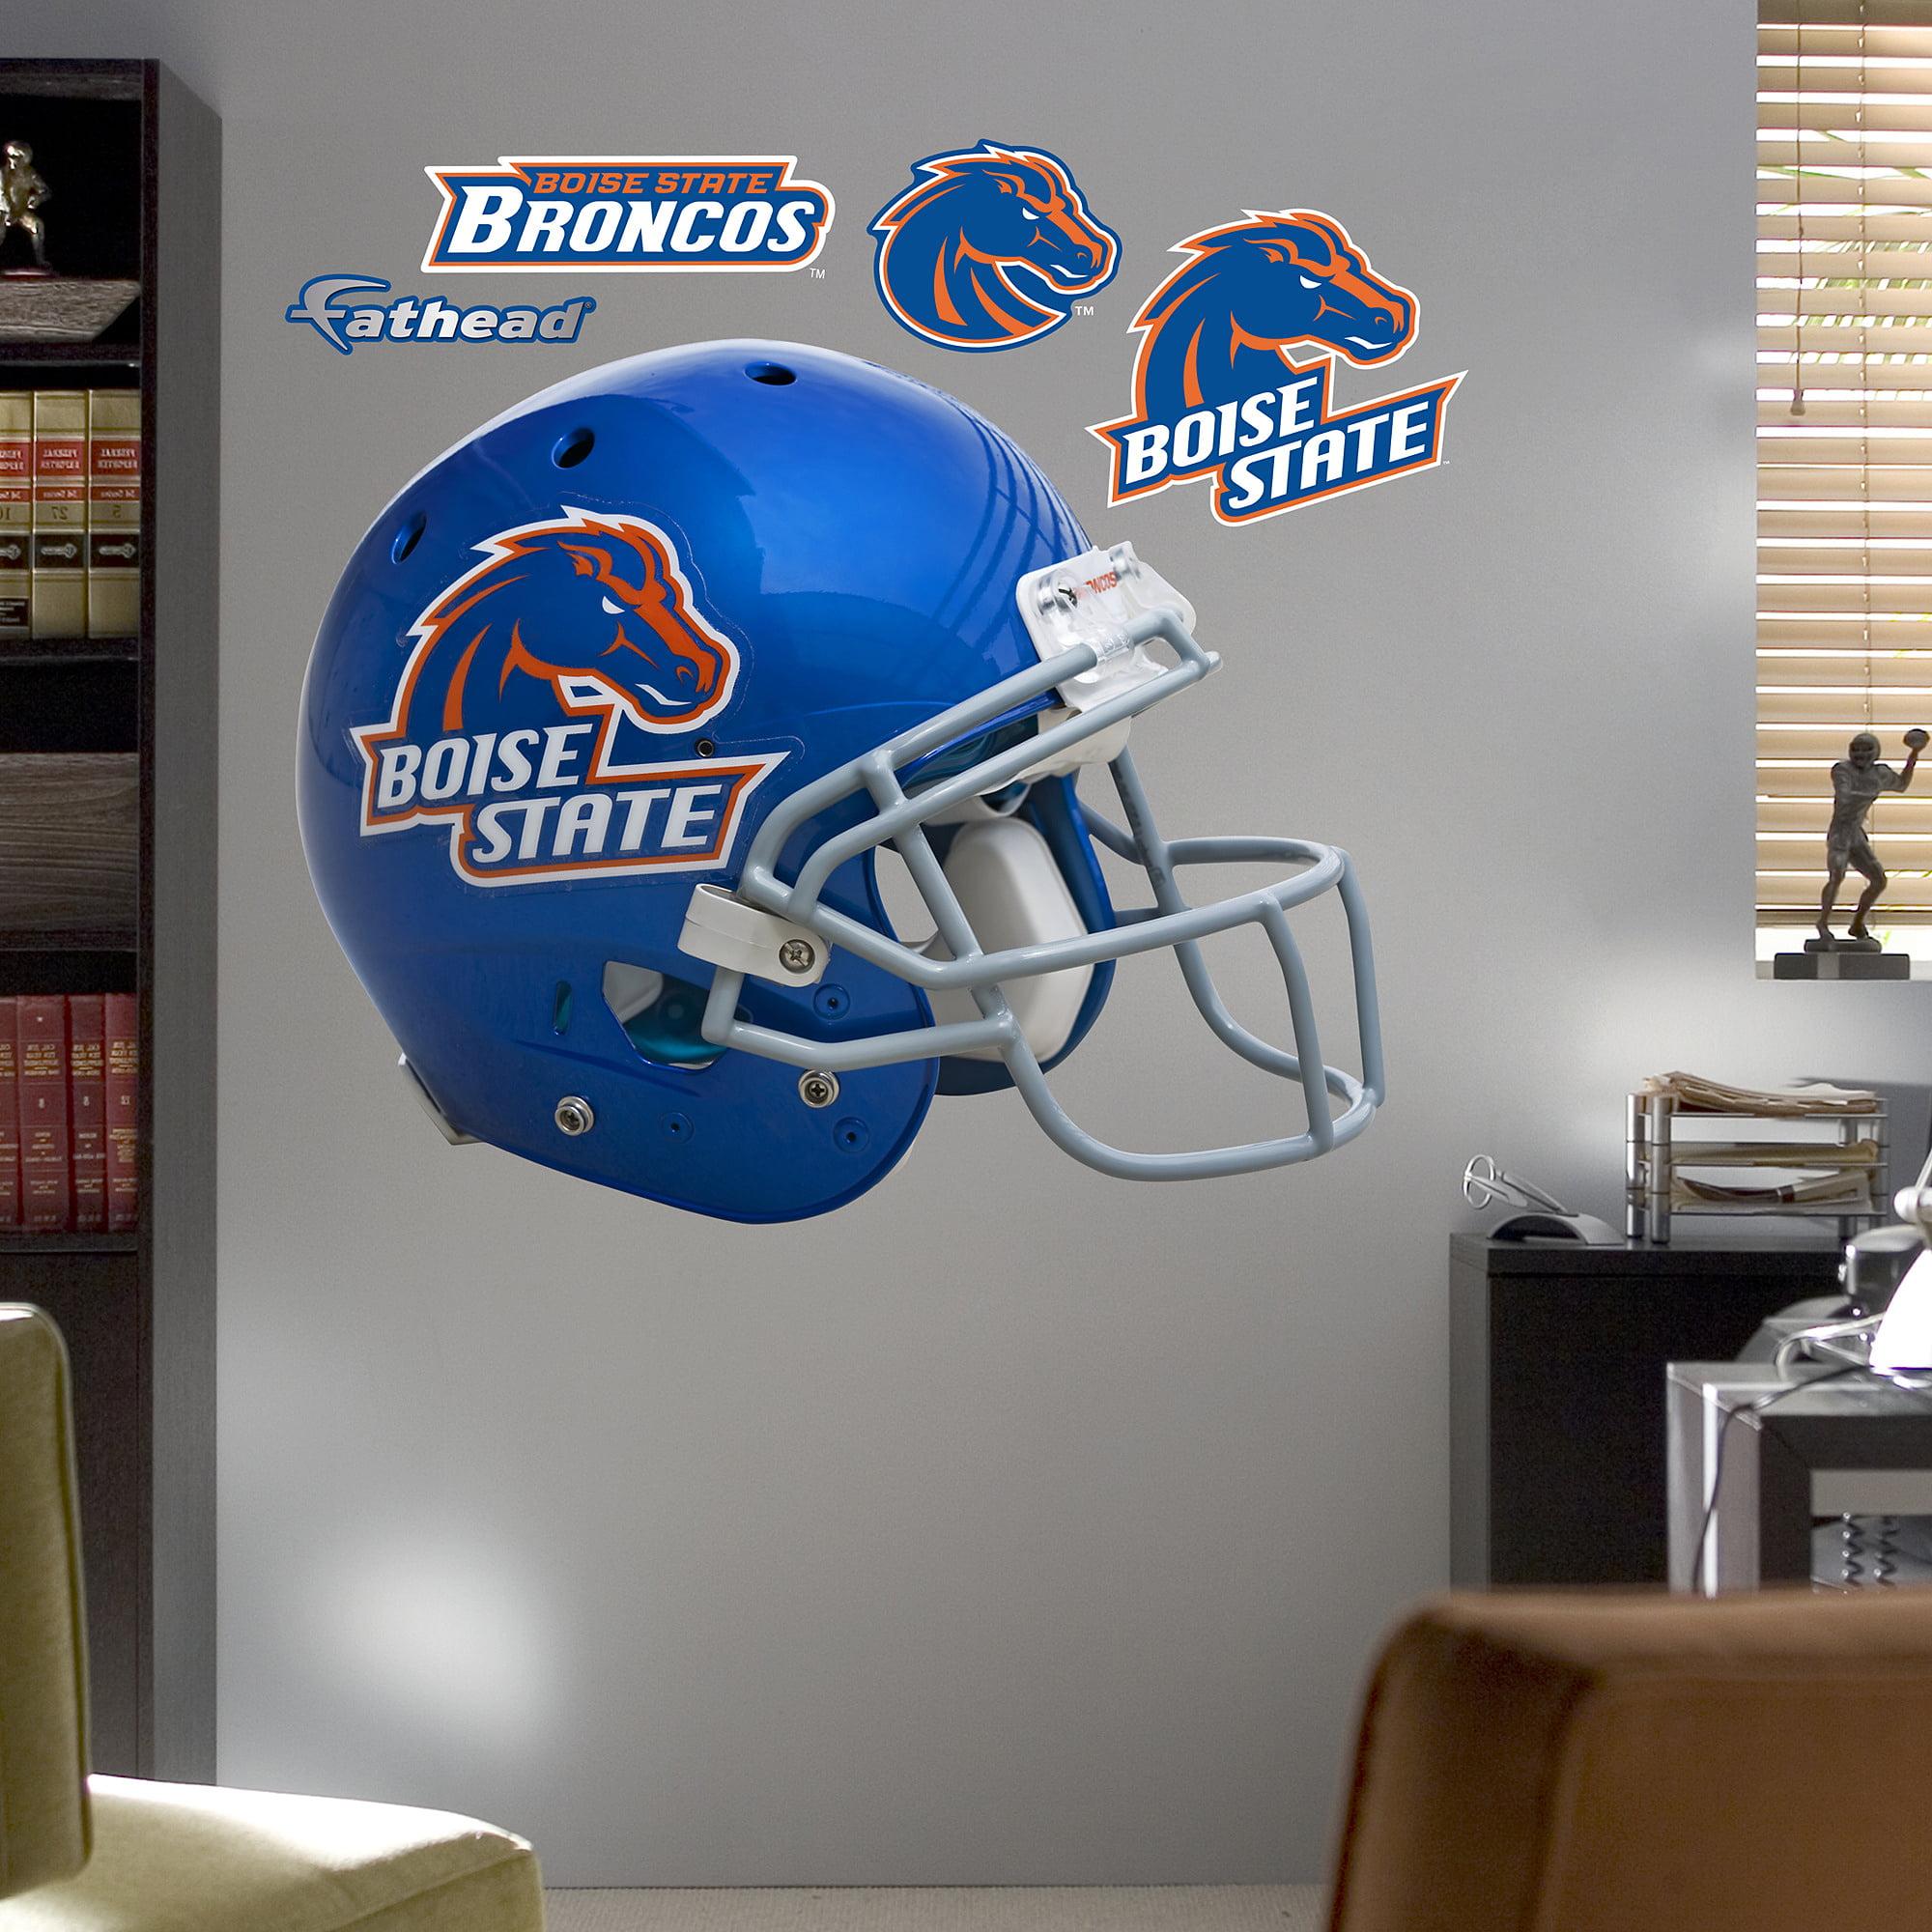 Boise State Broncos Helmet